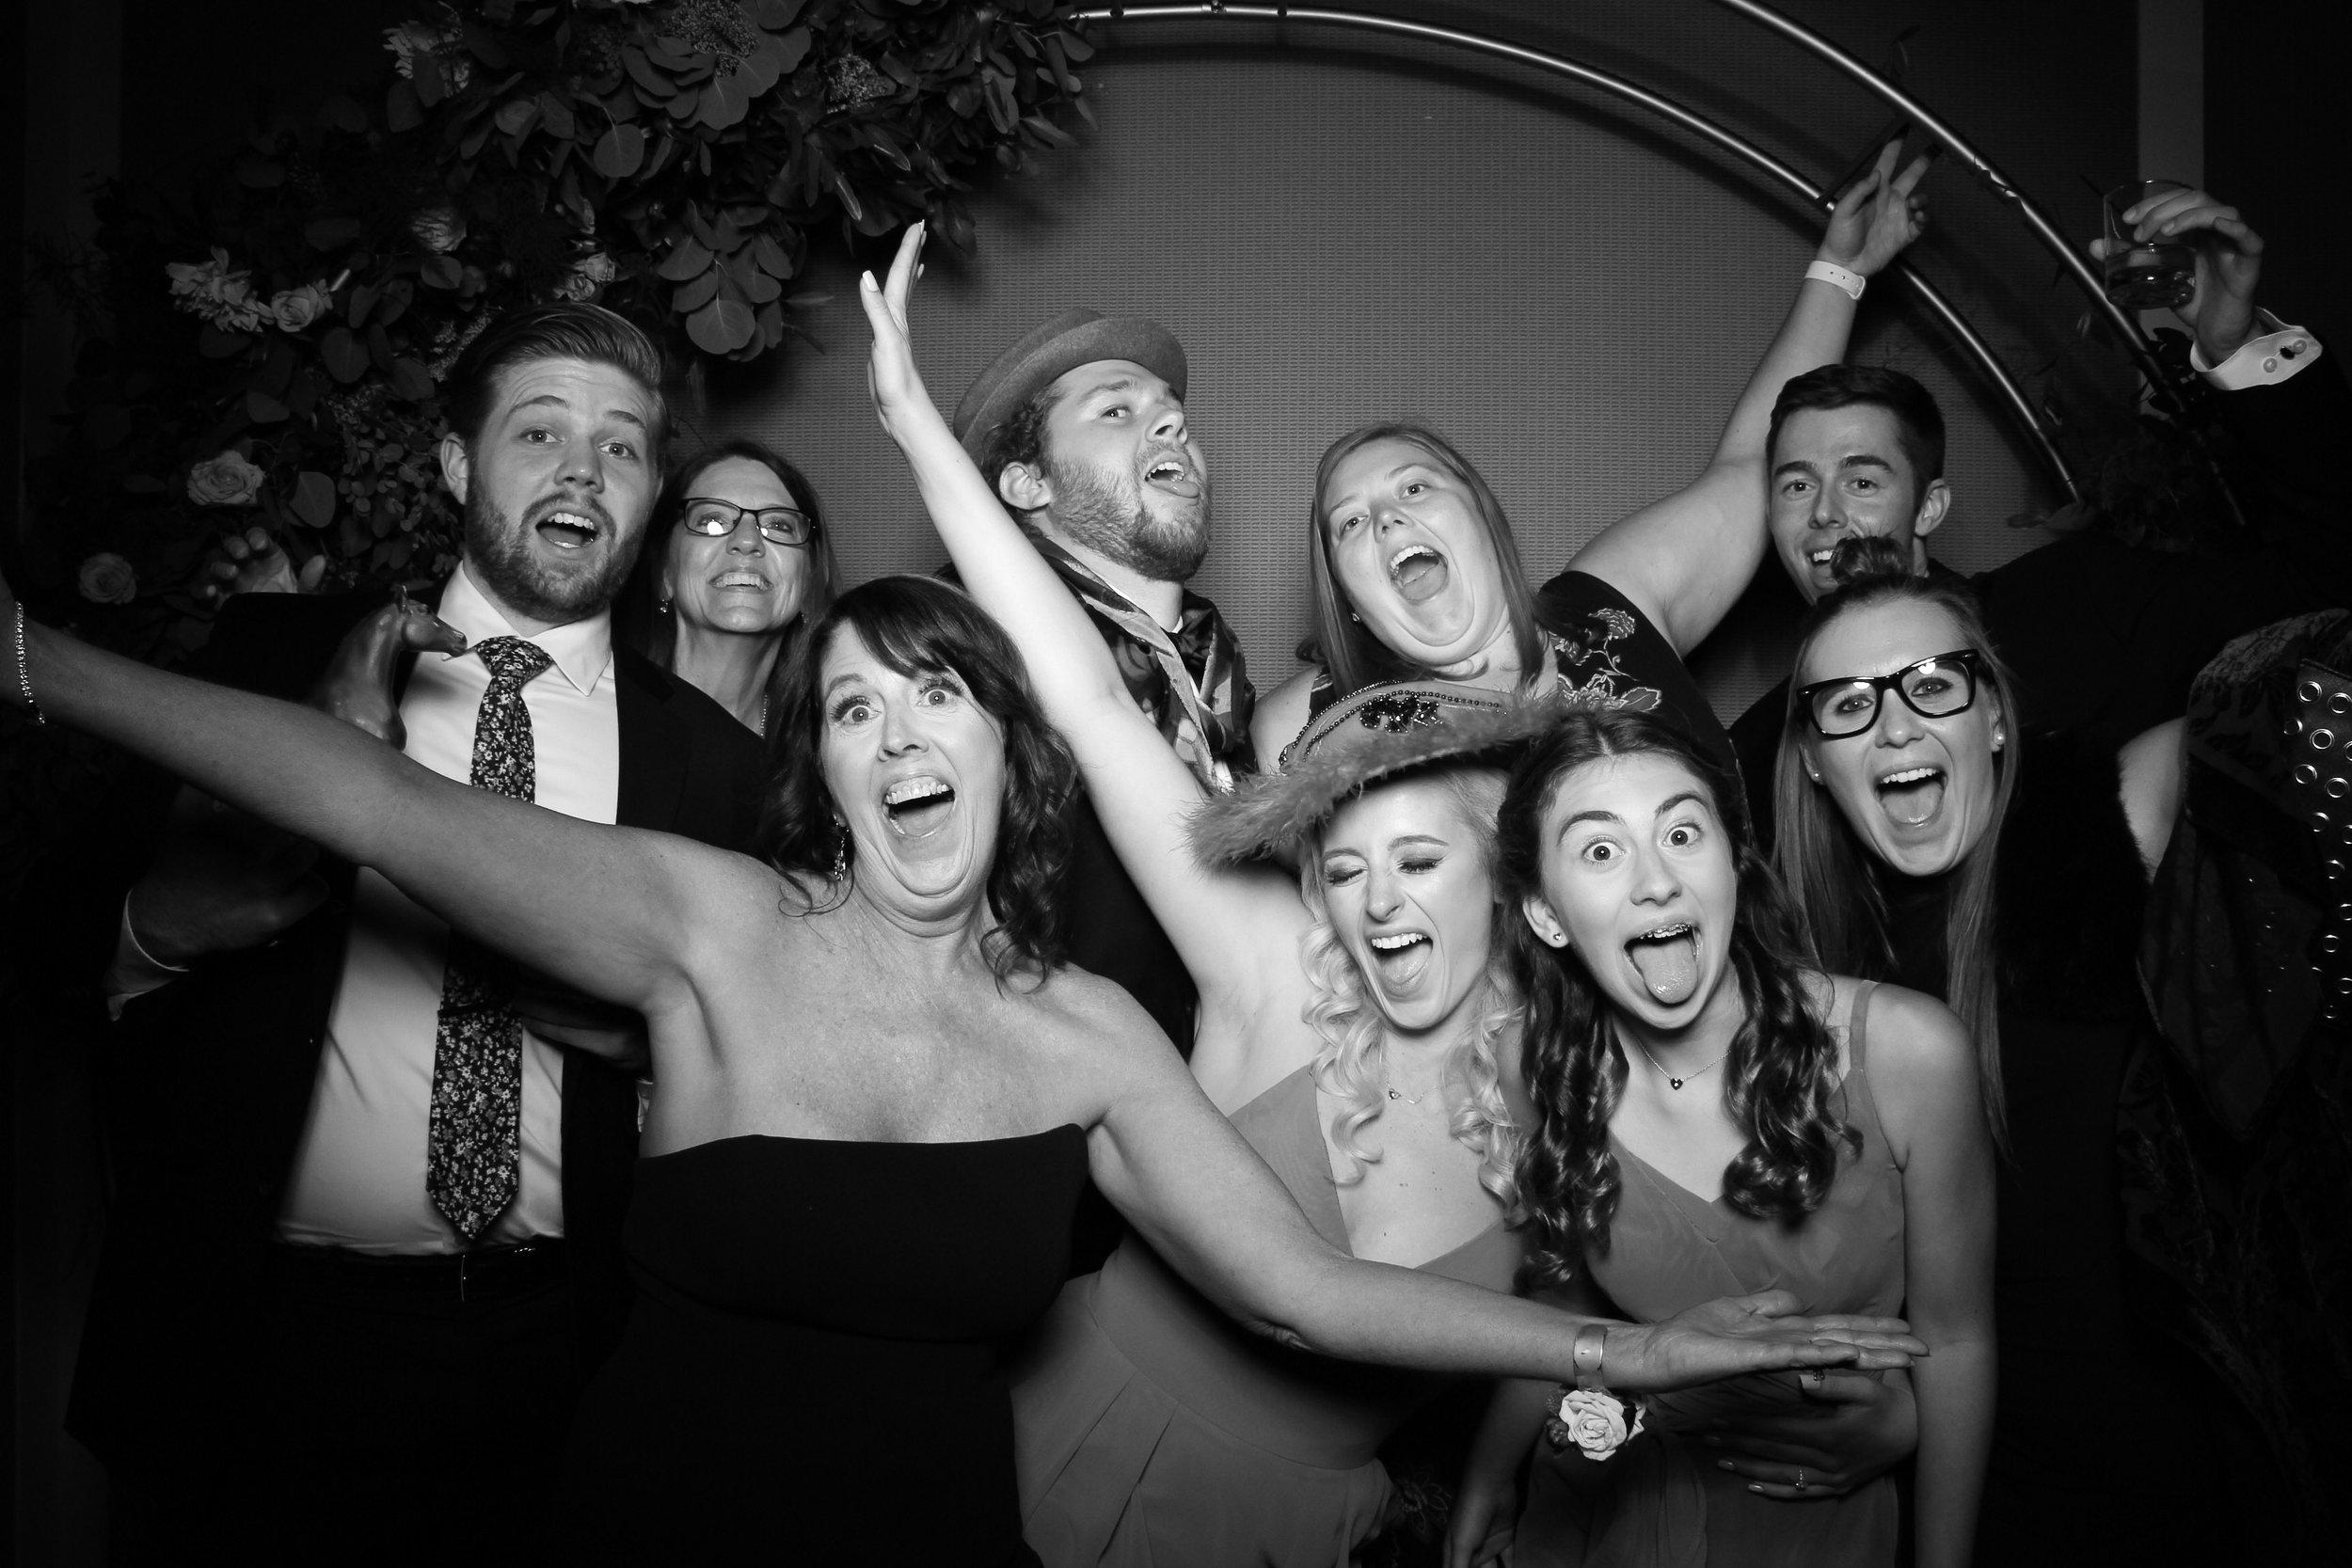 Metropolis_Ballroom_Wedding_Arlington_Heights_Photo_Booth_09.jpg